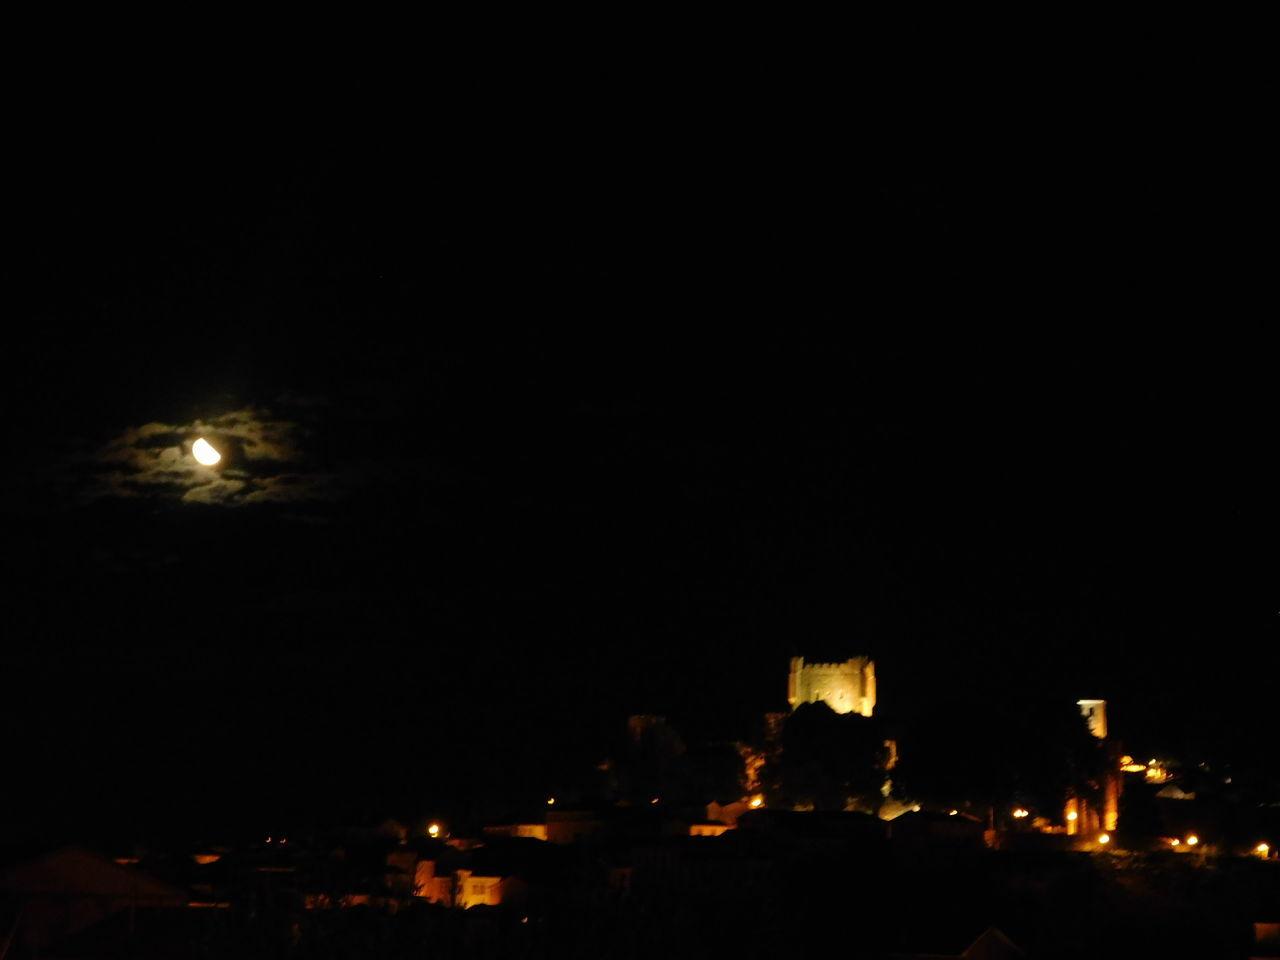 Bragança Bragançacastle Castle Castlesofportugal City Moonlight Night No People Sky Tranquility